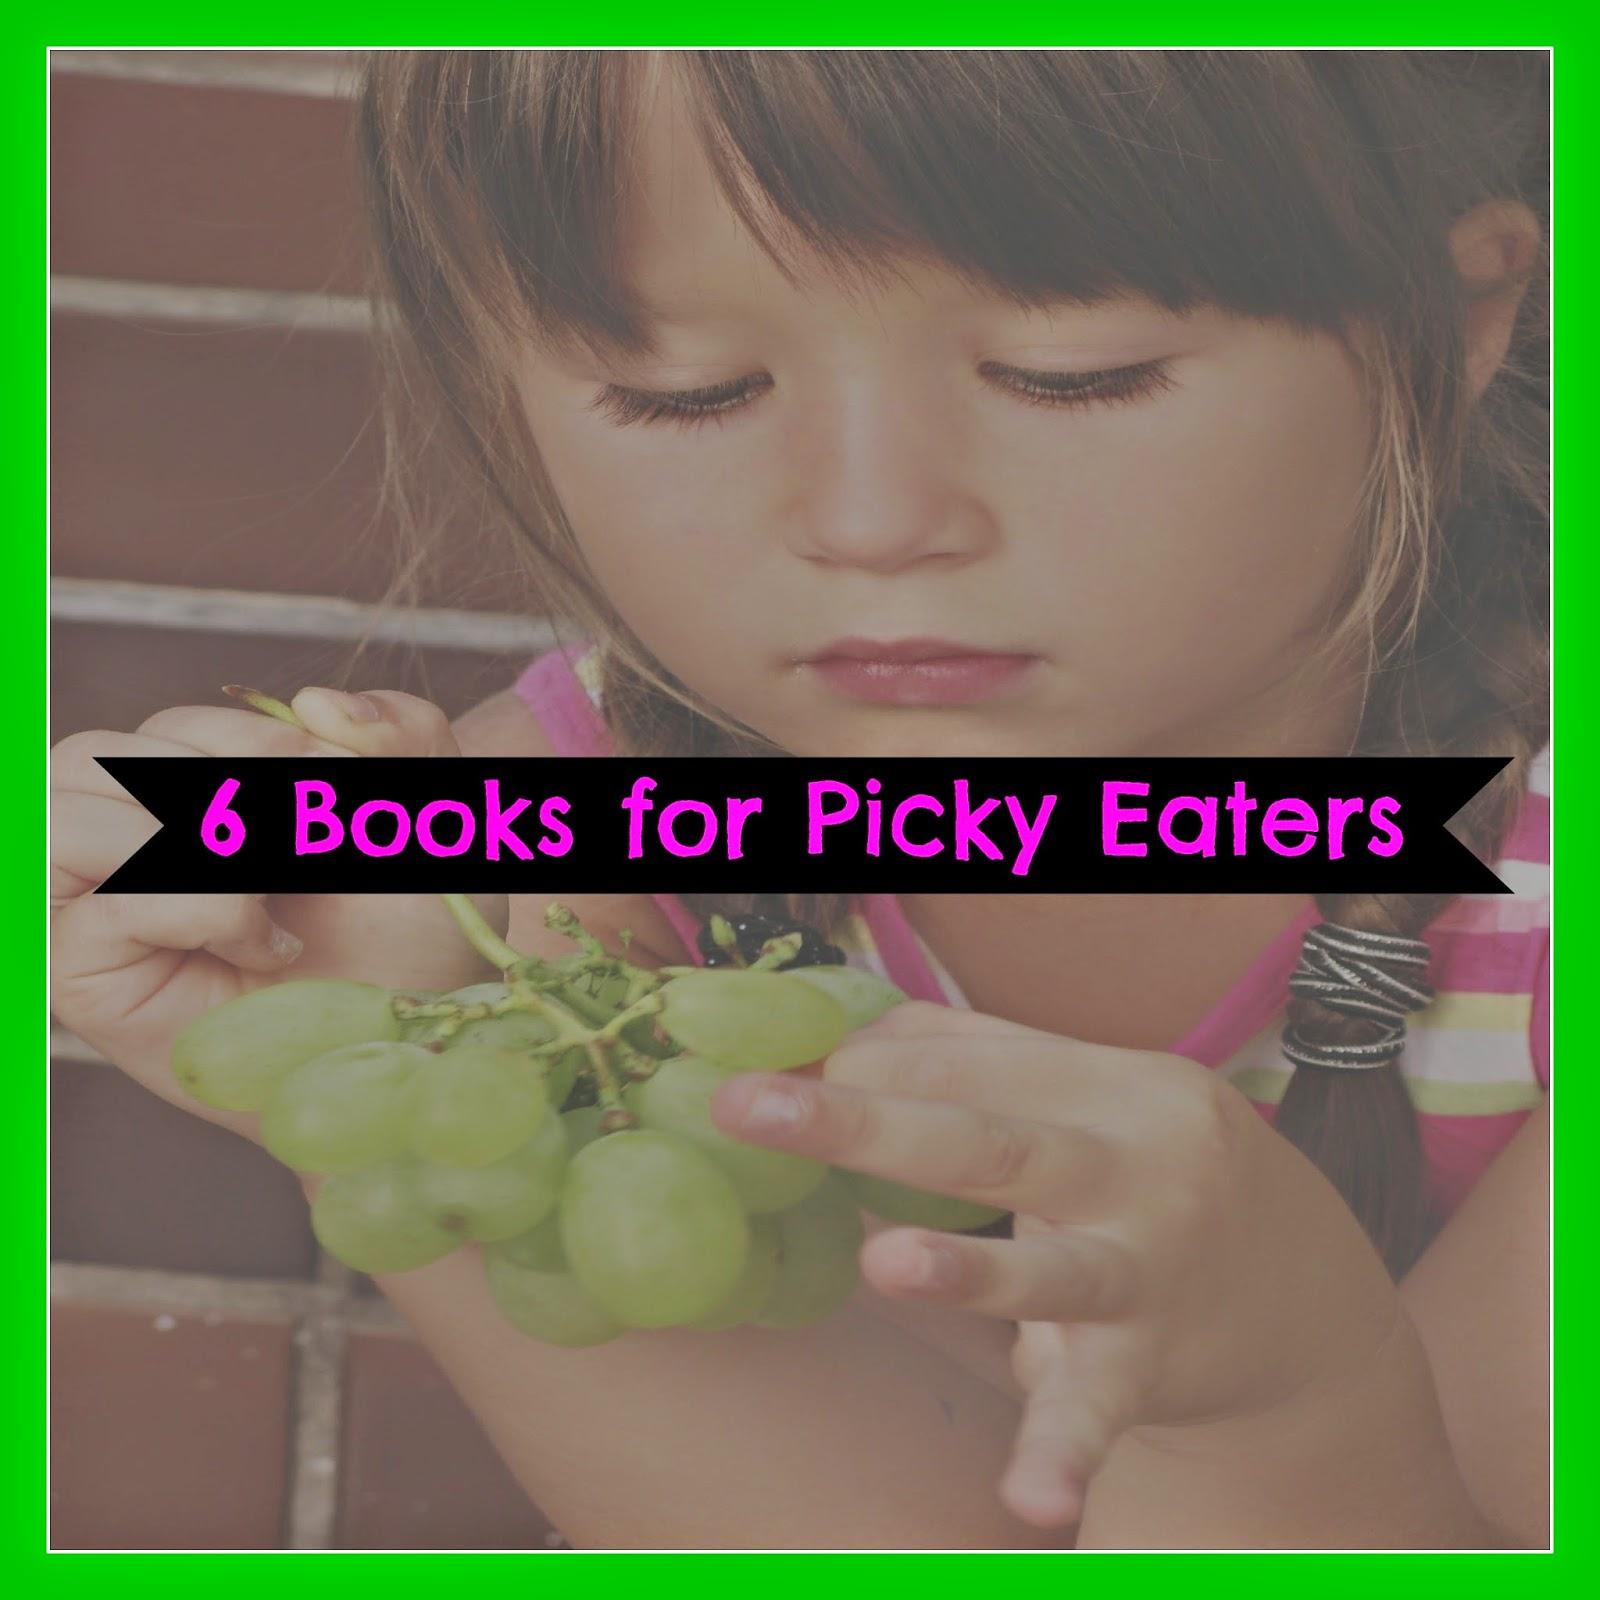 6 books for picky eaters from bighairandbooks.blogspot.com